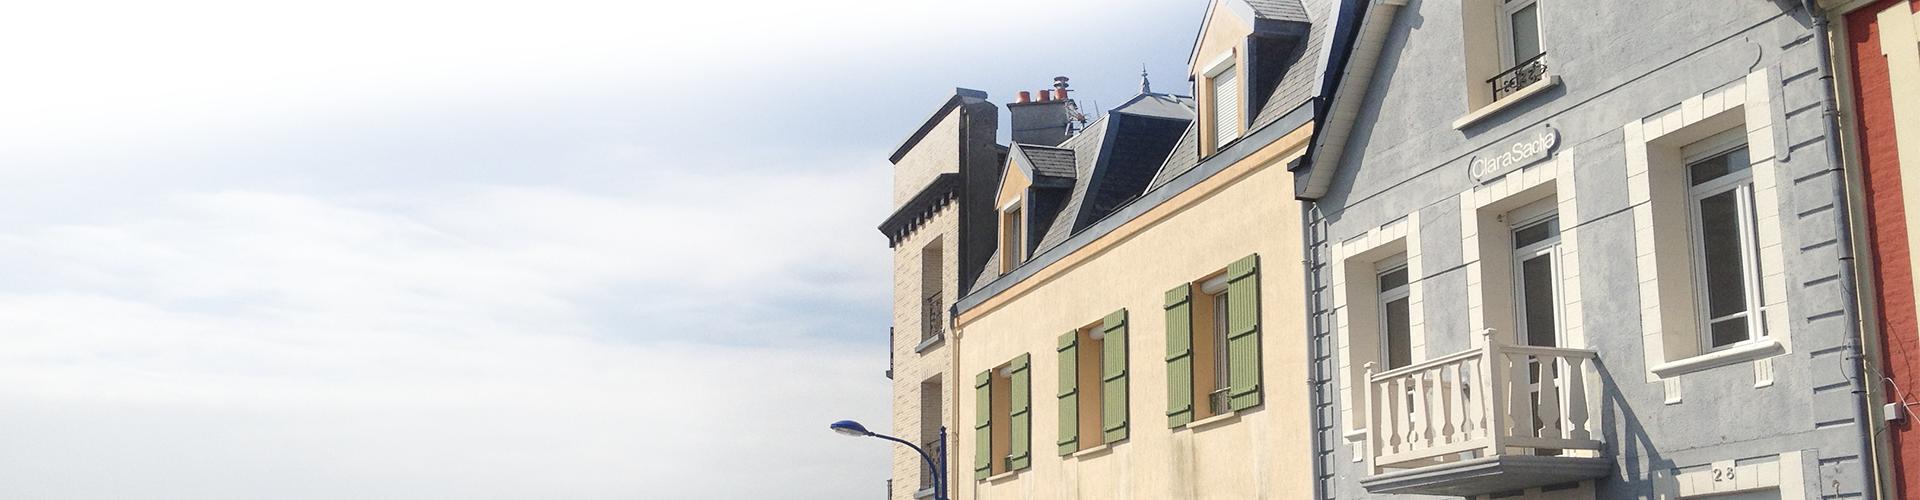 maisons-renovation-normandie